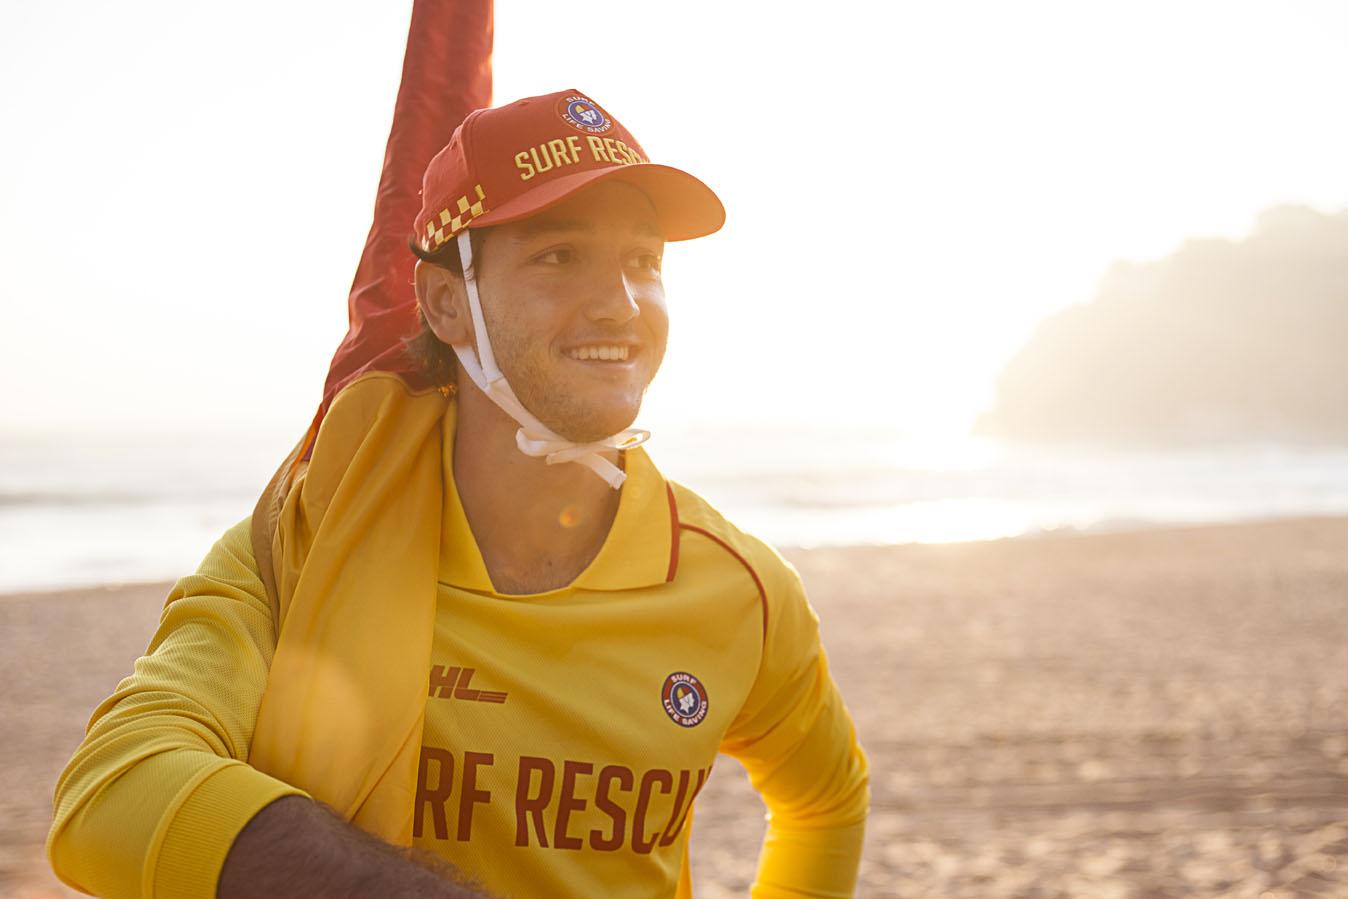 Saving Lives, Serious Fun - Kings Beach, Since 1933